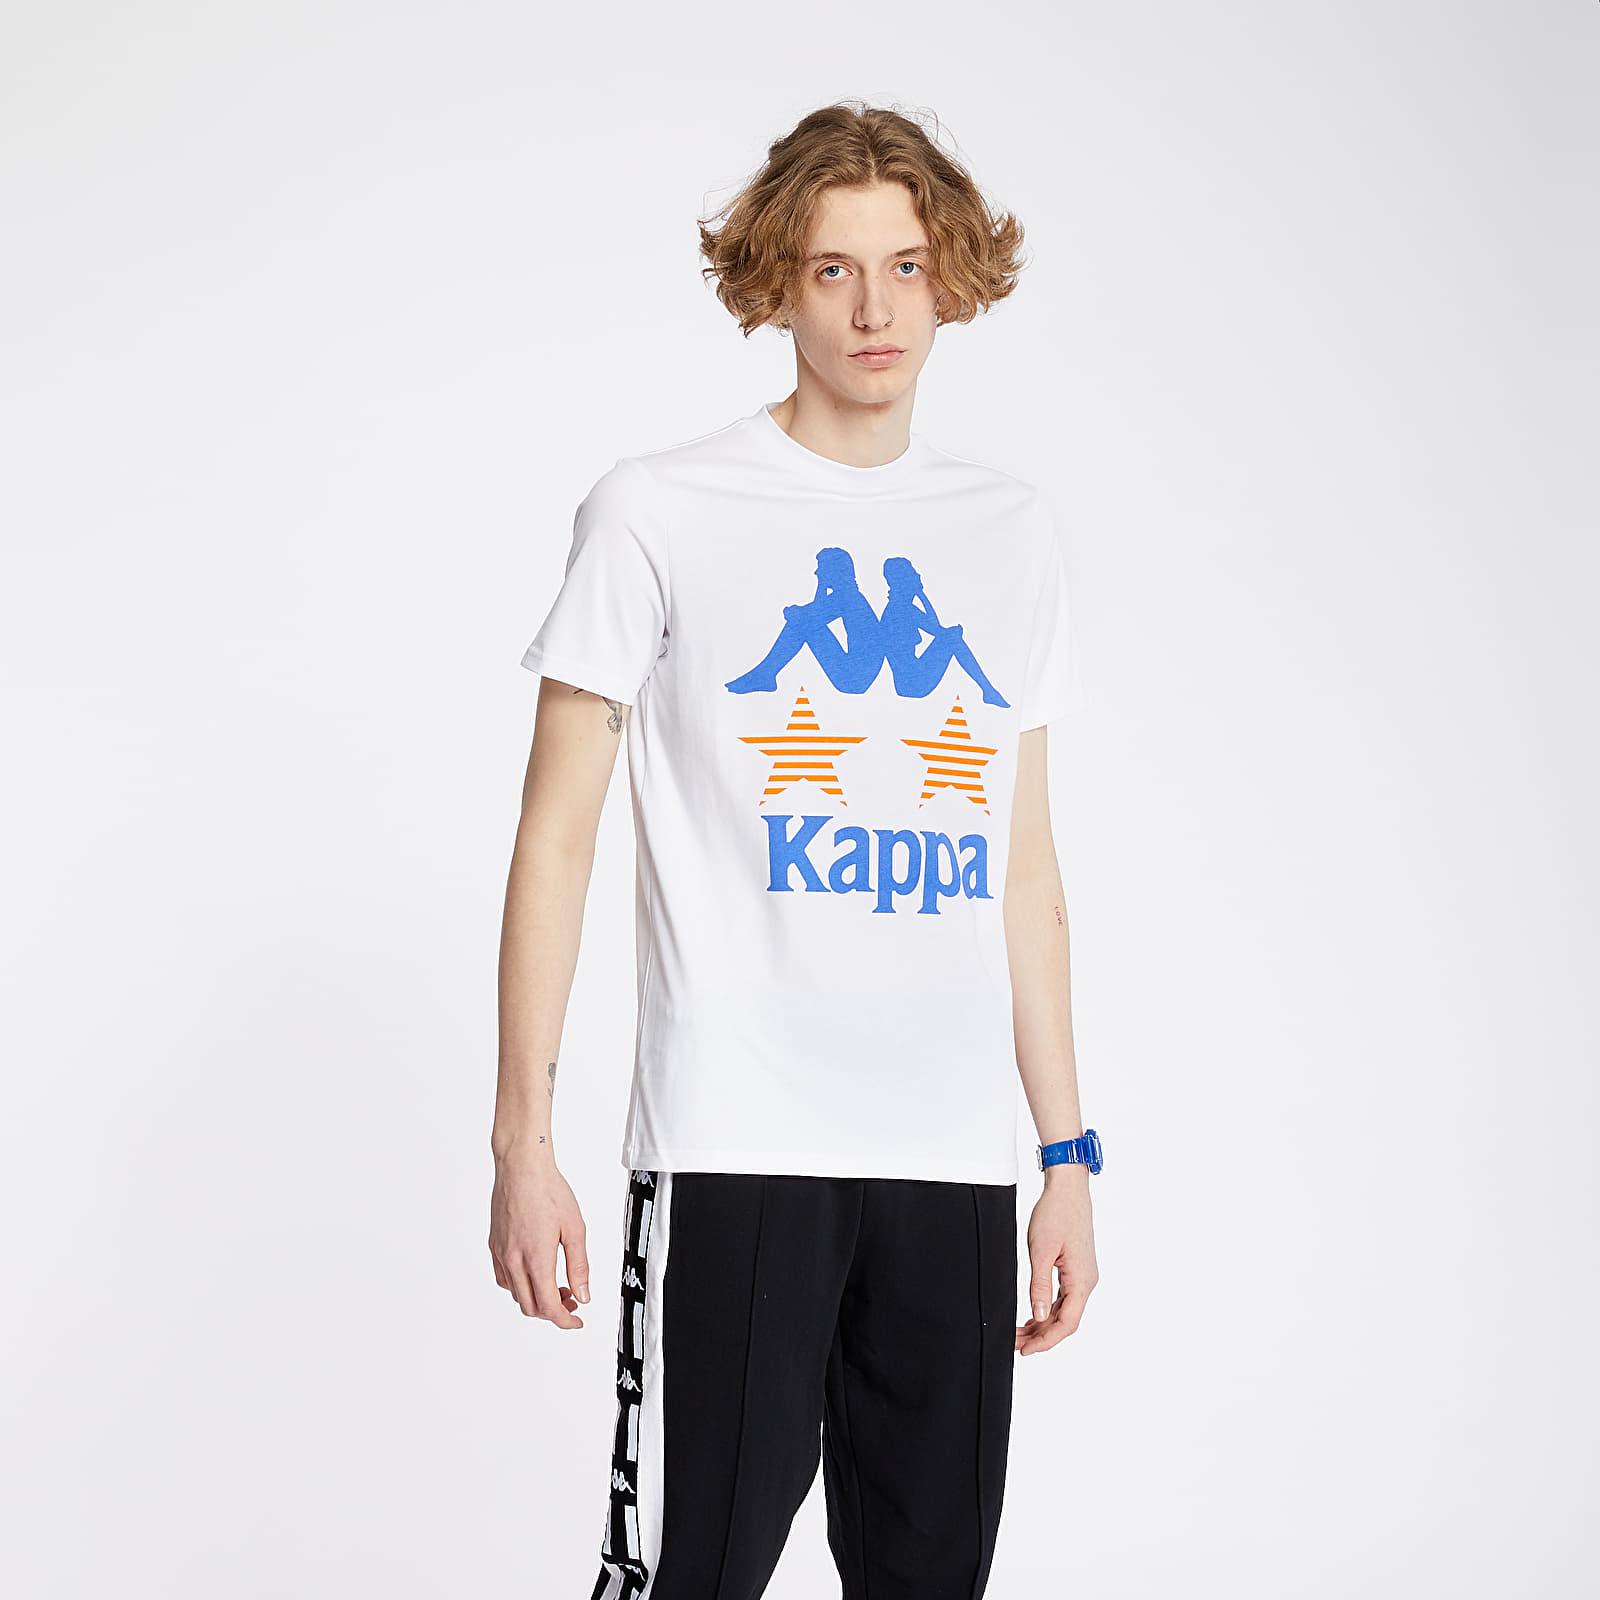 Kappa Authentic La Calmir Tee